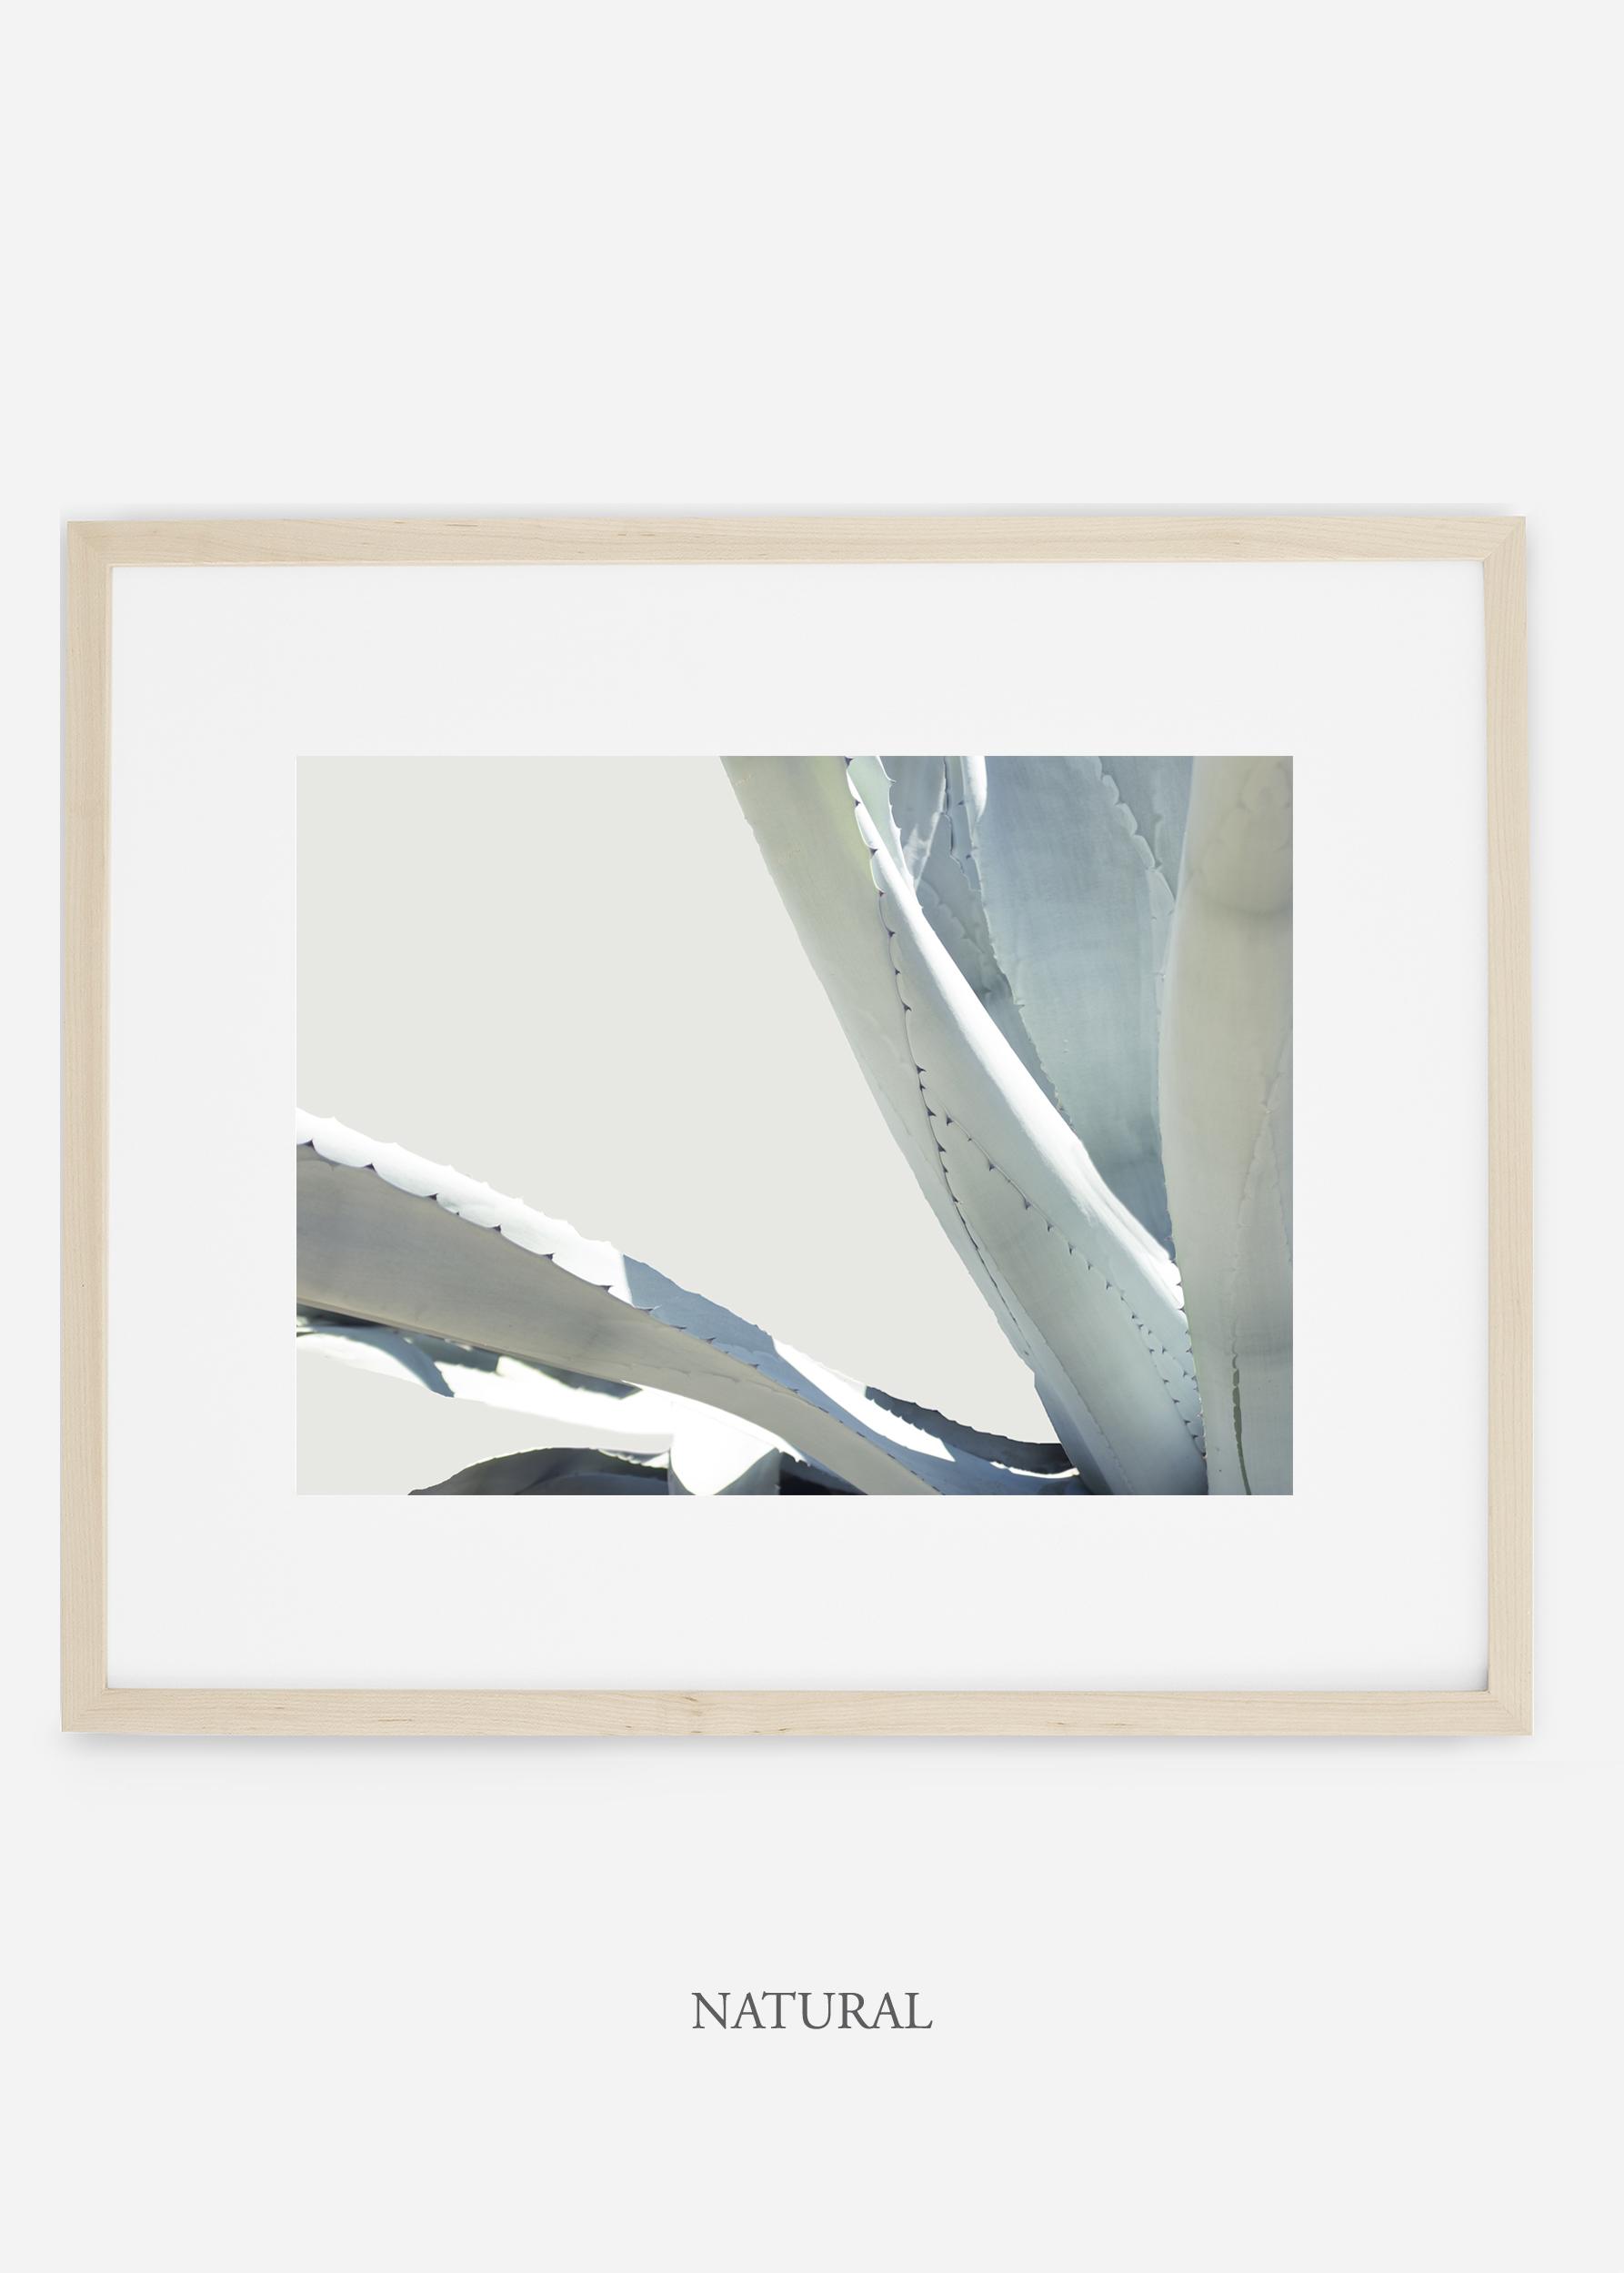 WilderCalifornia_naturalframe_WinterWhite_No6_Art_Photography_interiordesign_agave.jpg